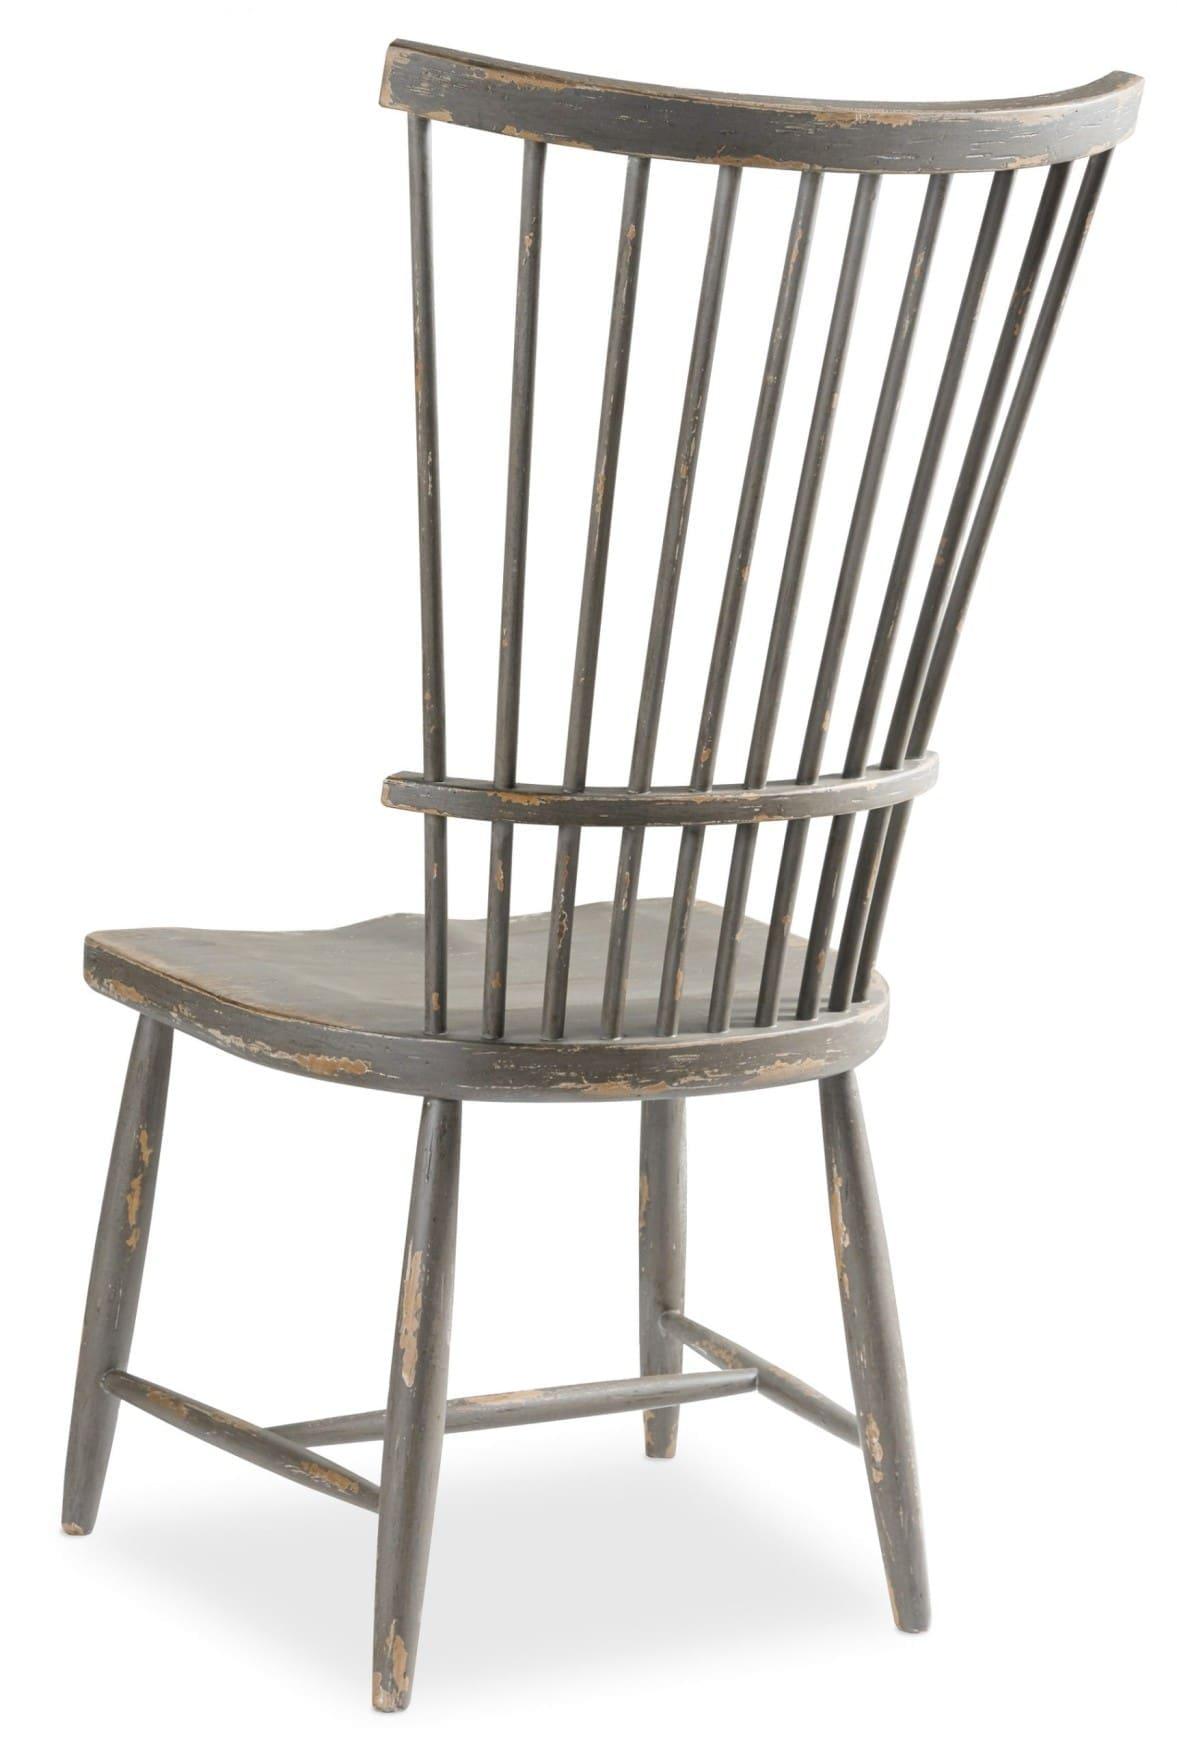 Alfresco Marzano Windsor Side Chair - 2 per carton/price ea